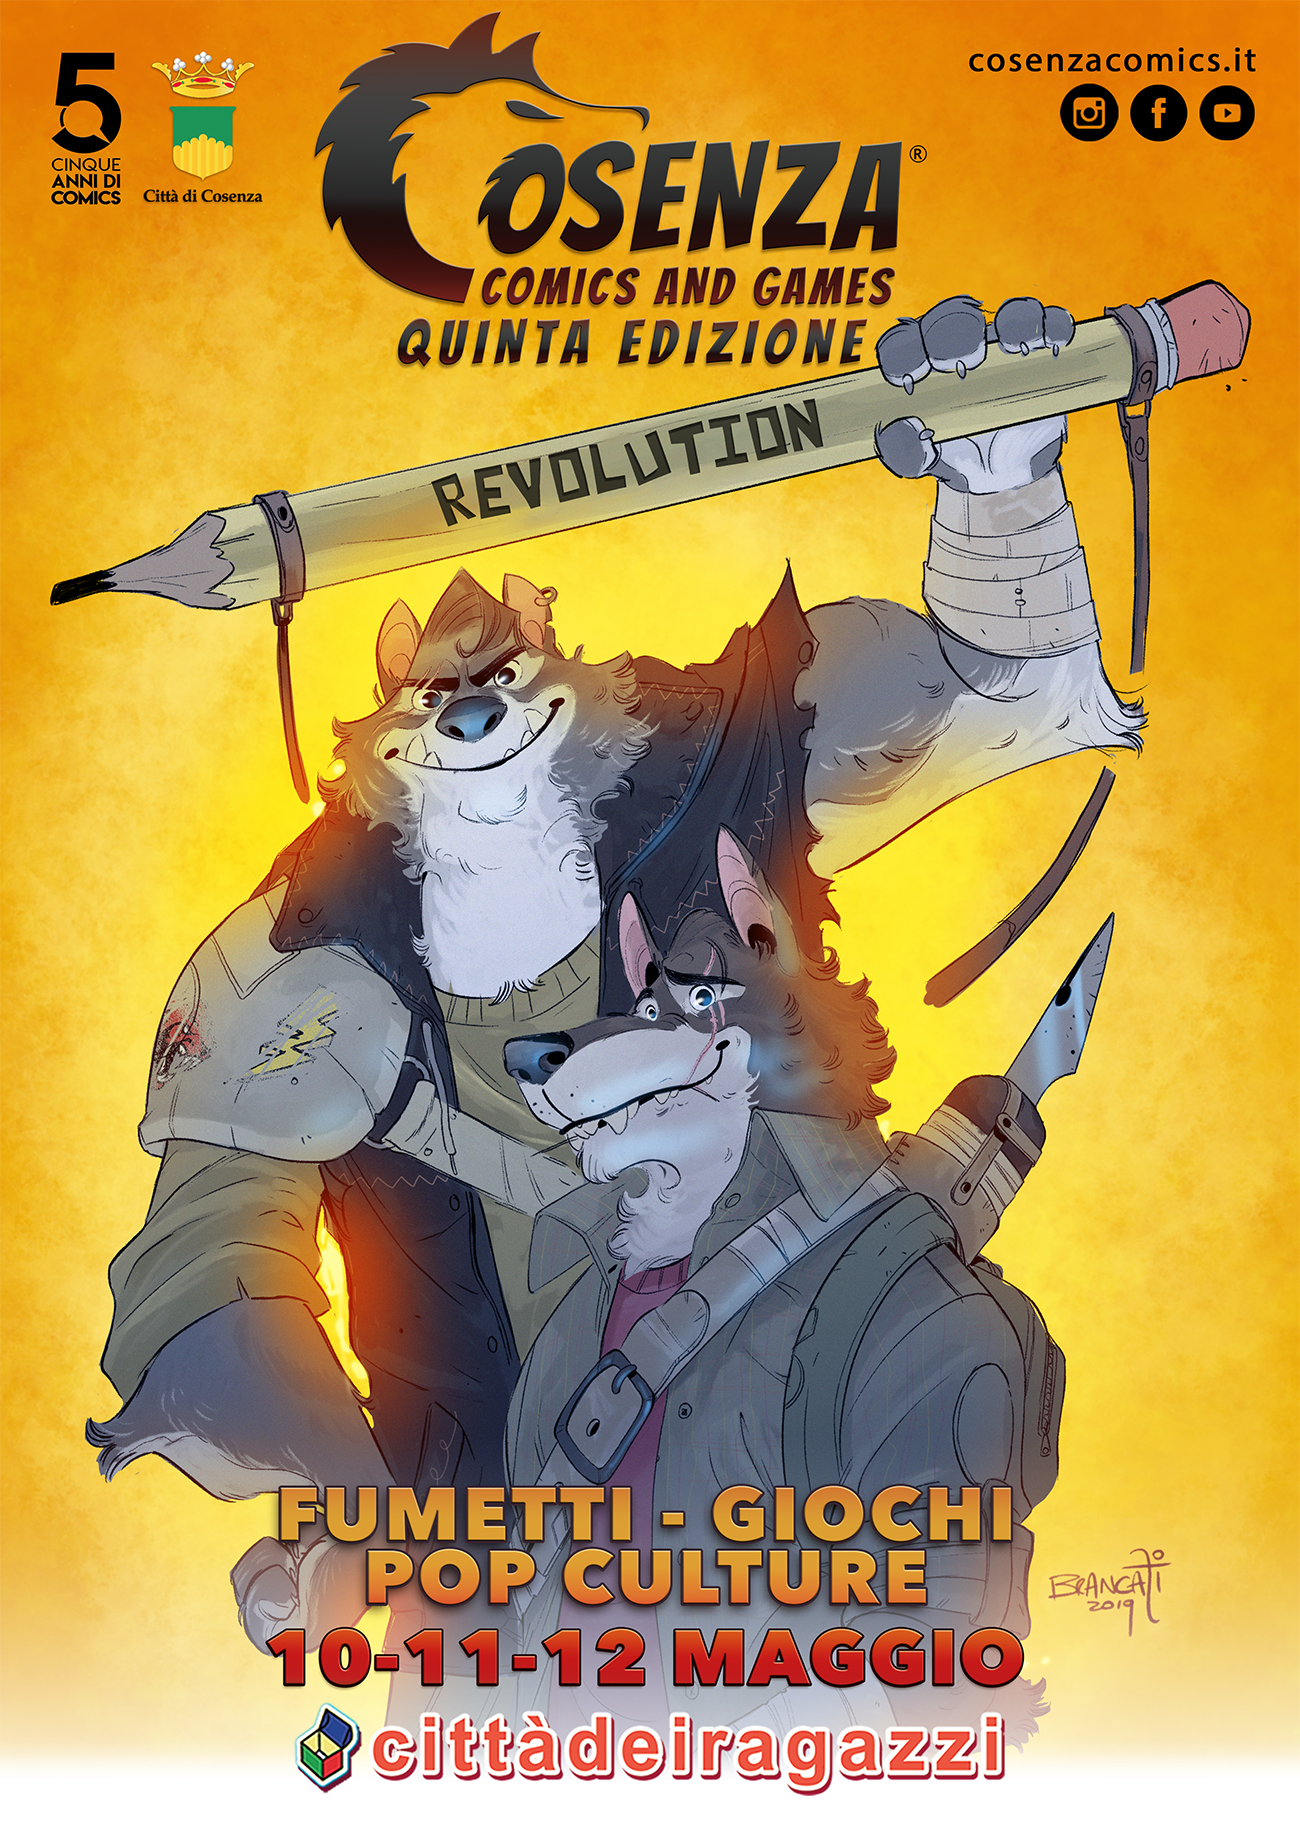 Locandina Comics cs 2019